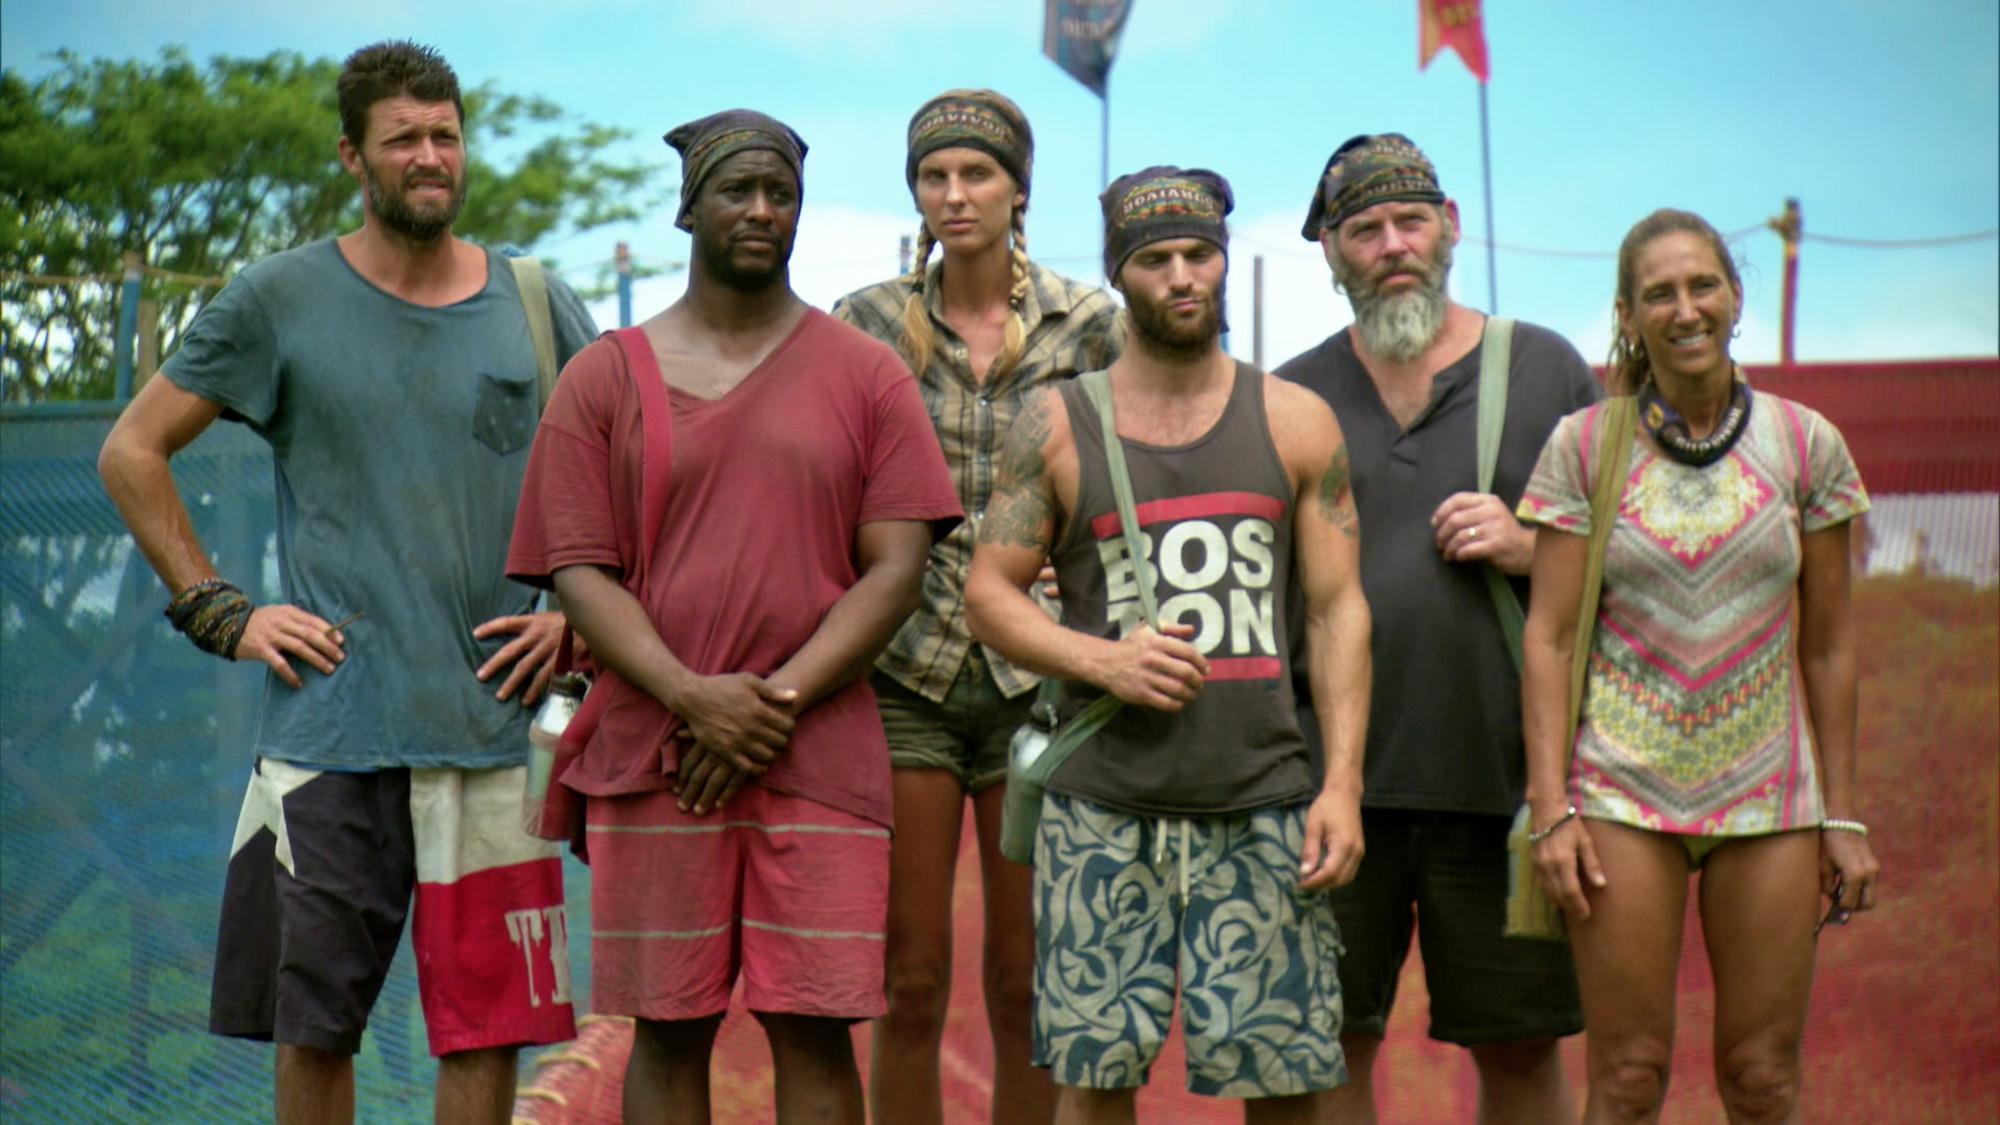 The final castaways of Survivor Season 30